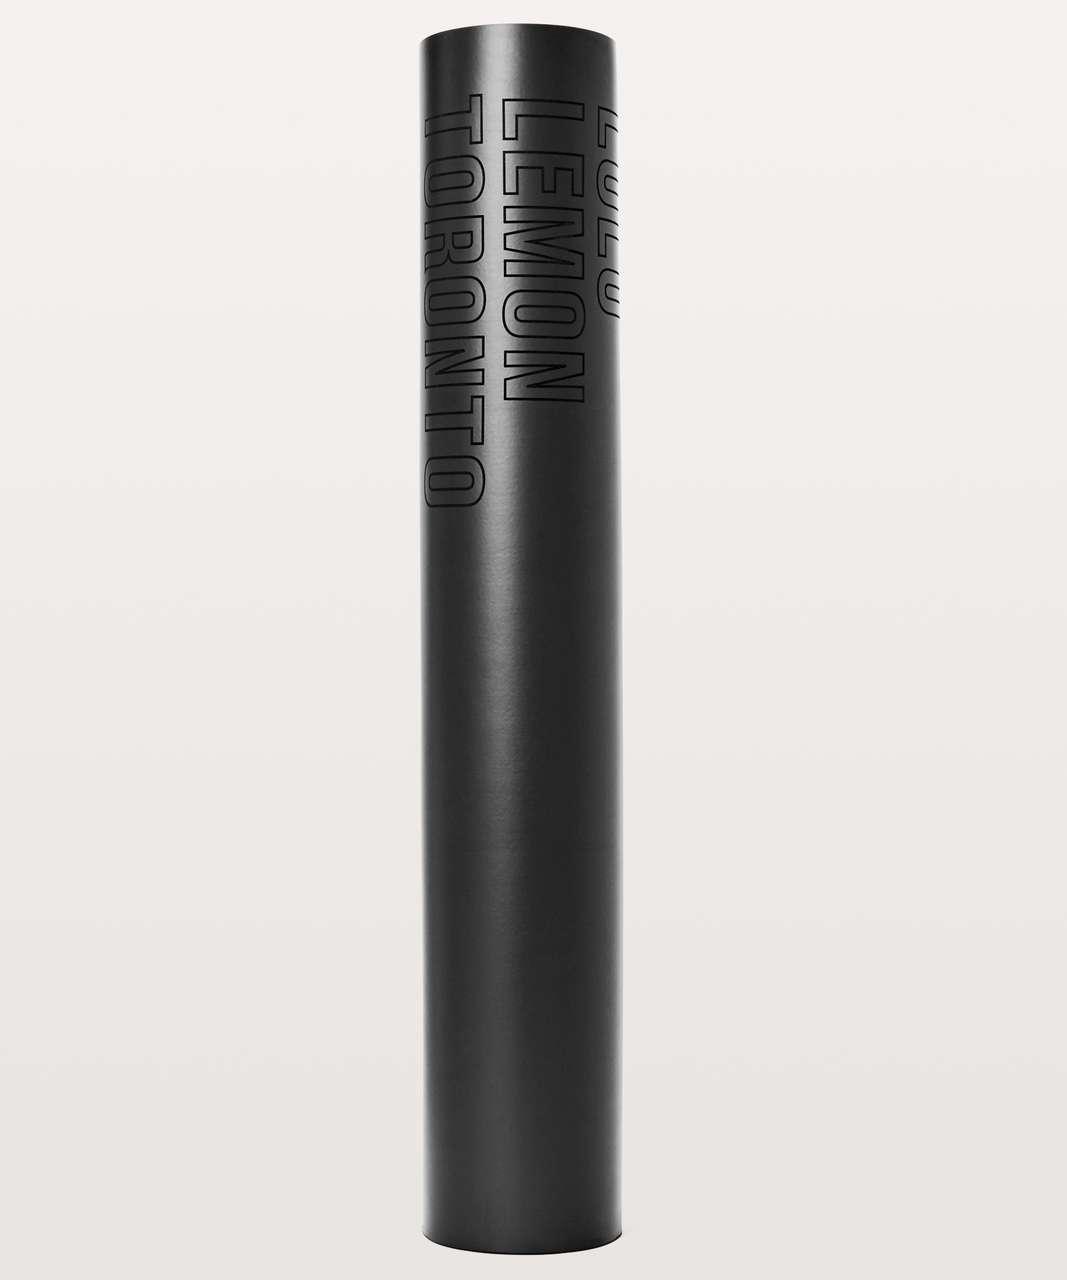 Lululemon The Reversible Mat 5mm Toronto - My City Mat Toronto